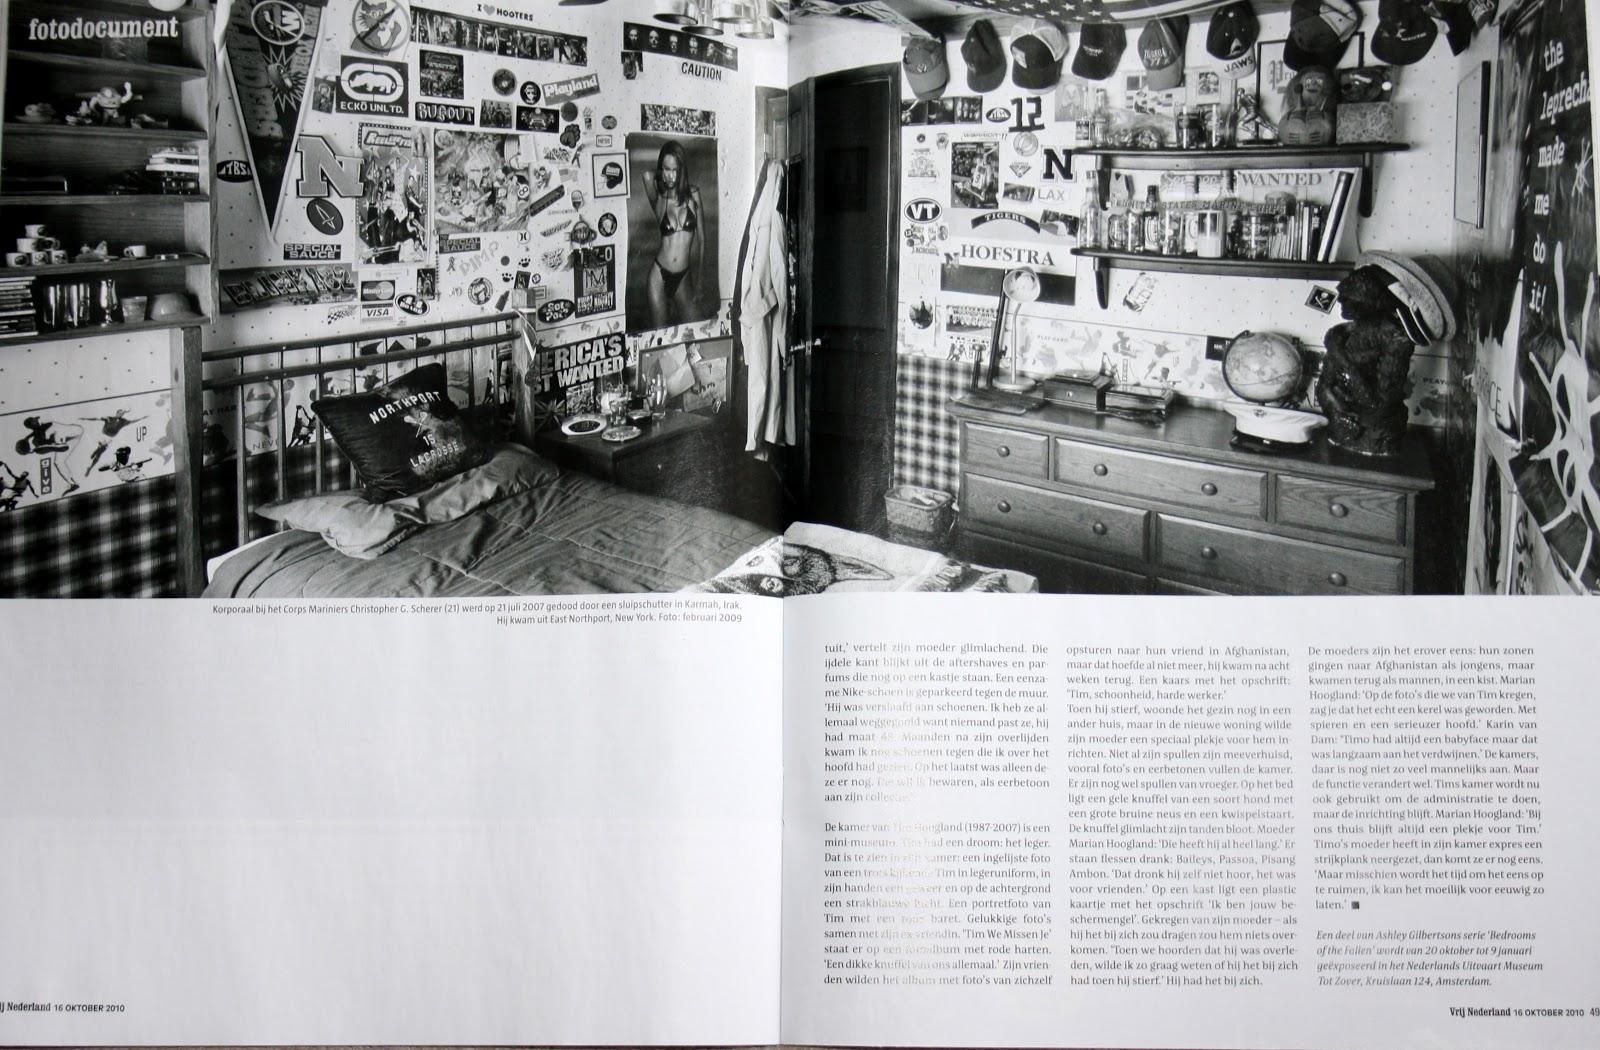 bint photobooks on internet bedrooms of the fallen ashley gilbertson